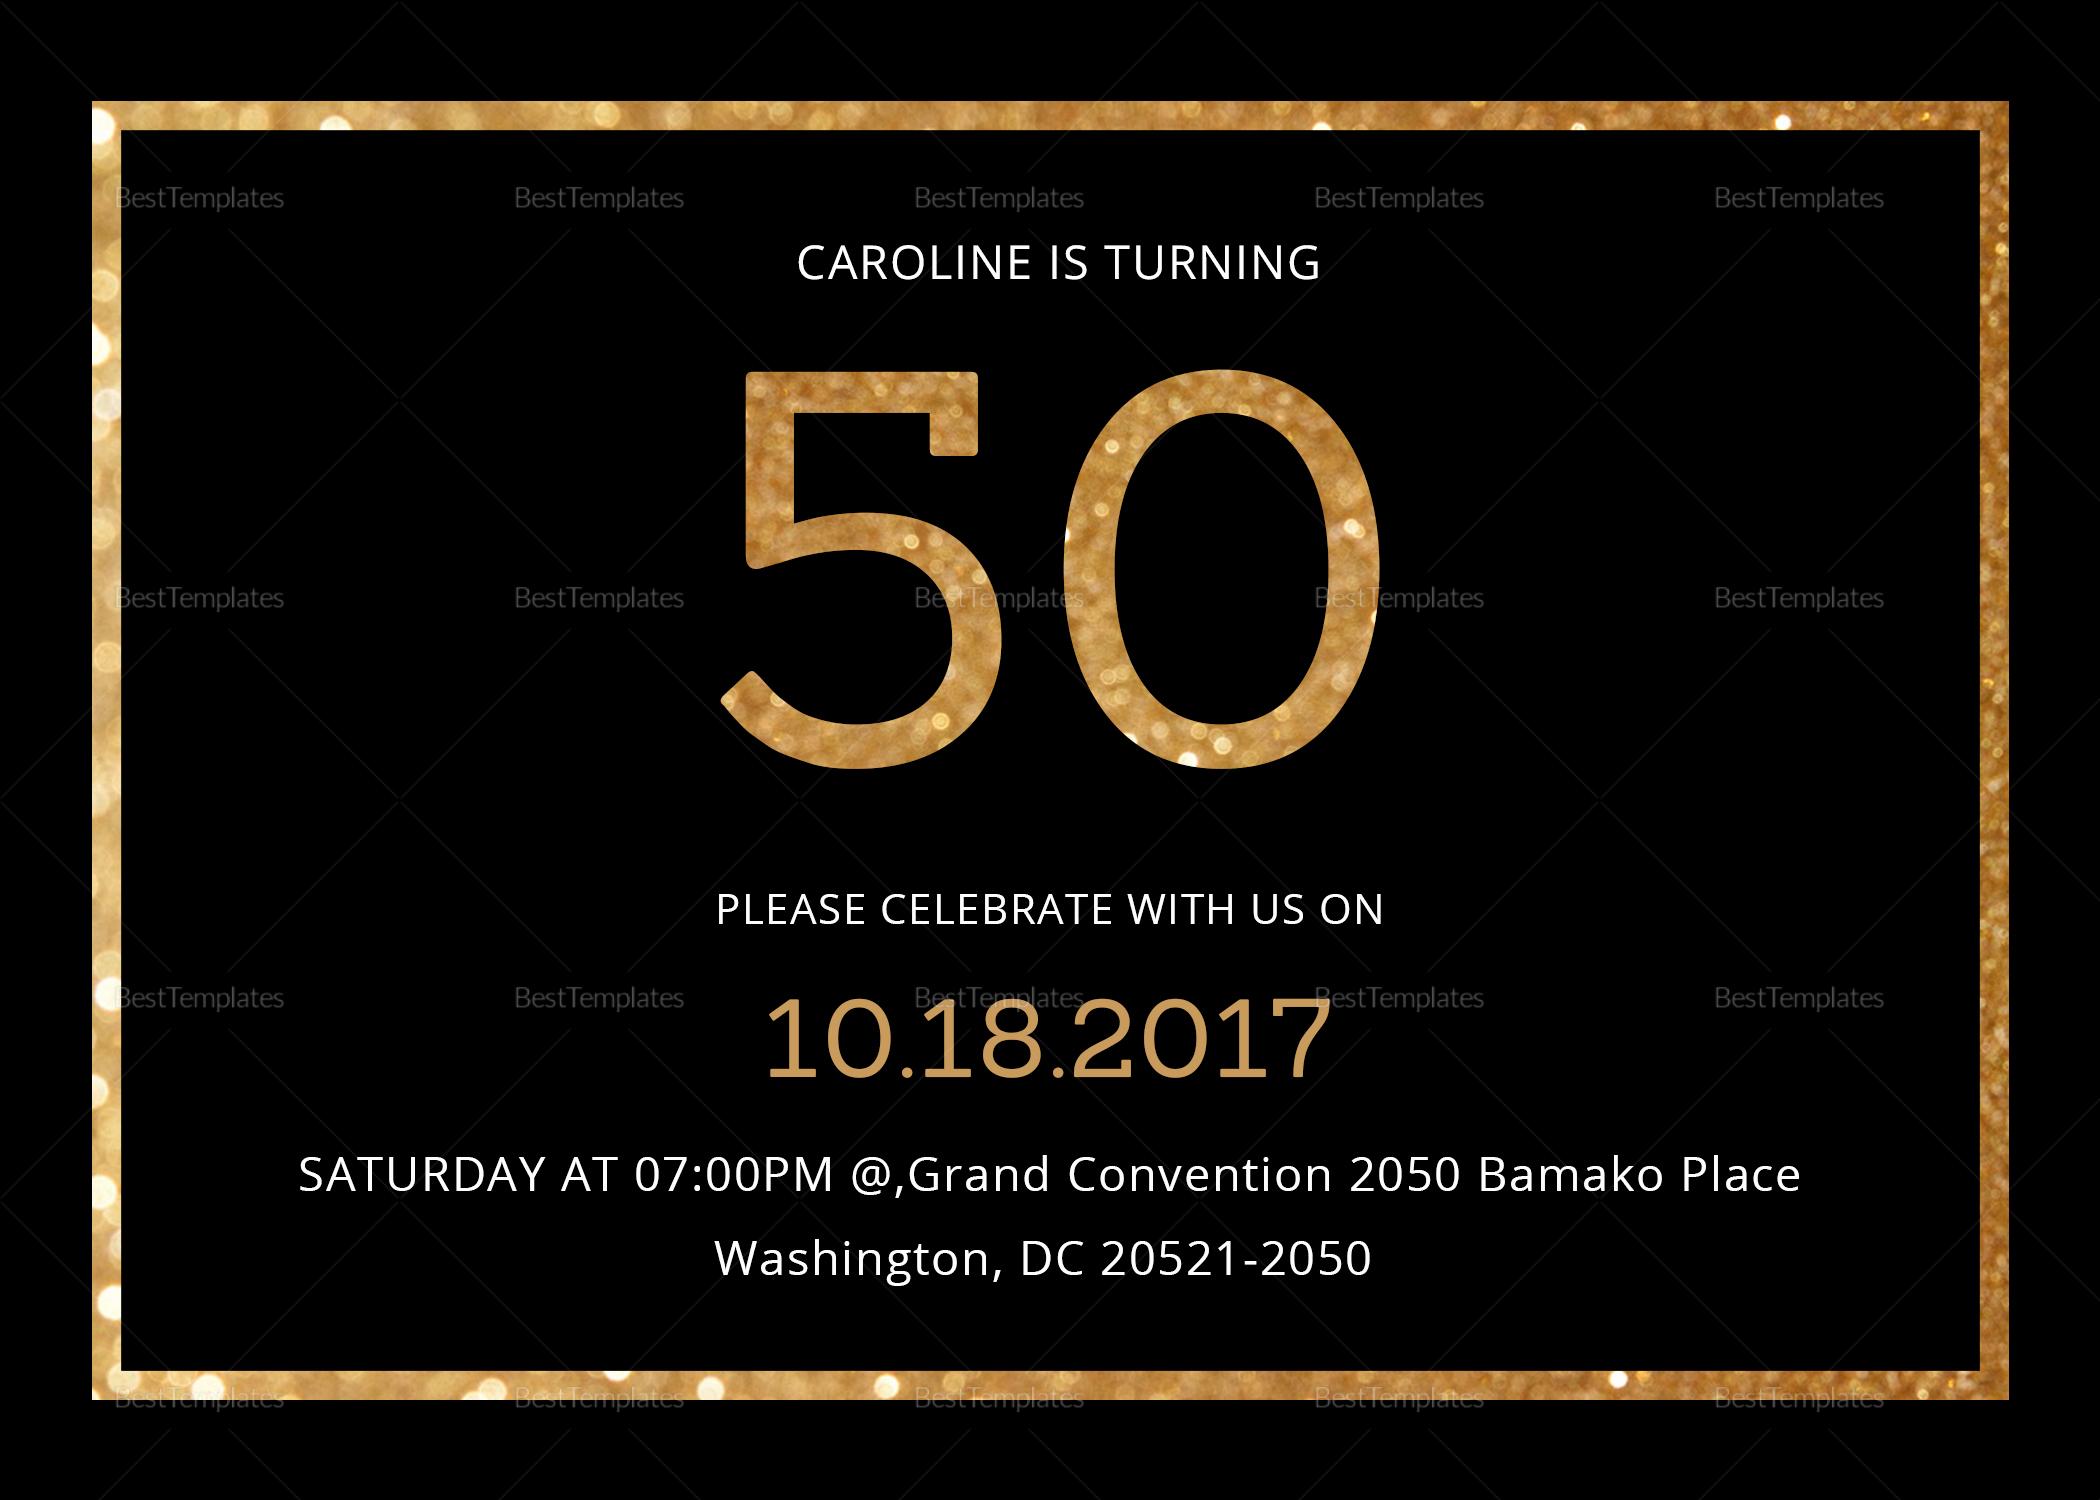 50th Birthday Invitation Template Elegant Elegant Black and Gold 50th Birthday Invitation Design